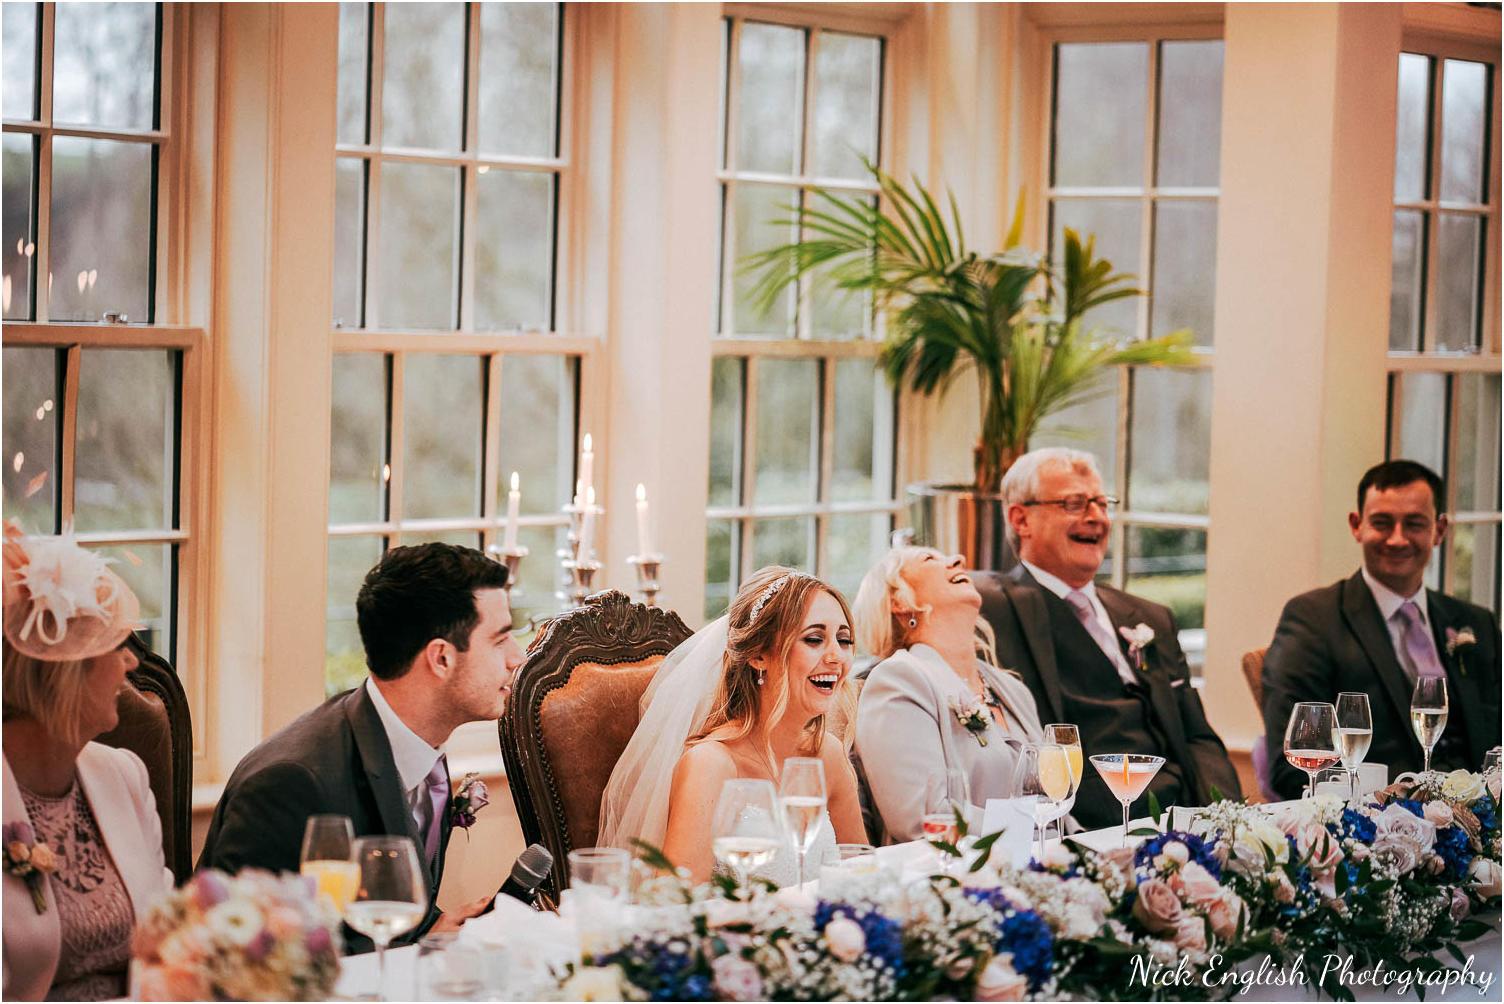 Mitton_Hall_Wedding_Photographer_2018-137.jpg